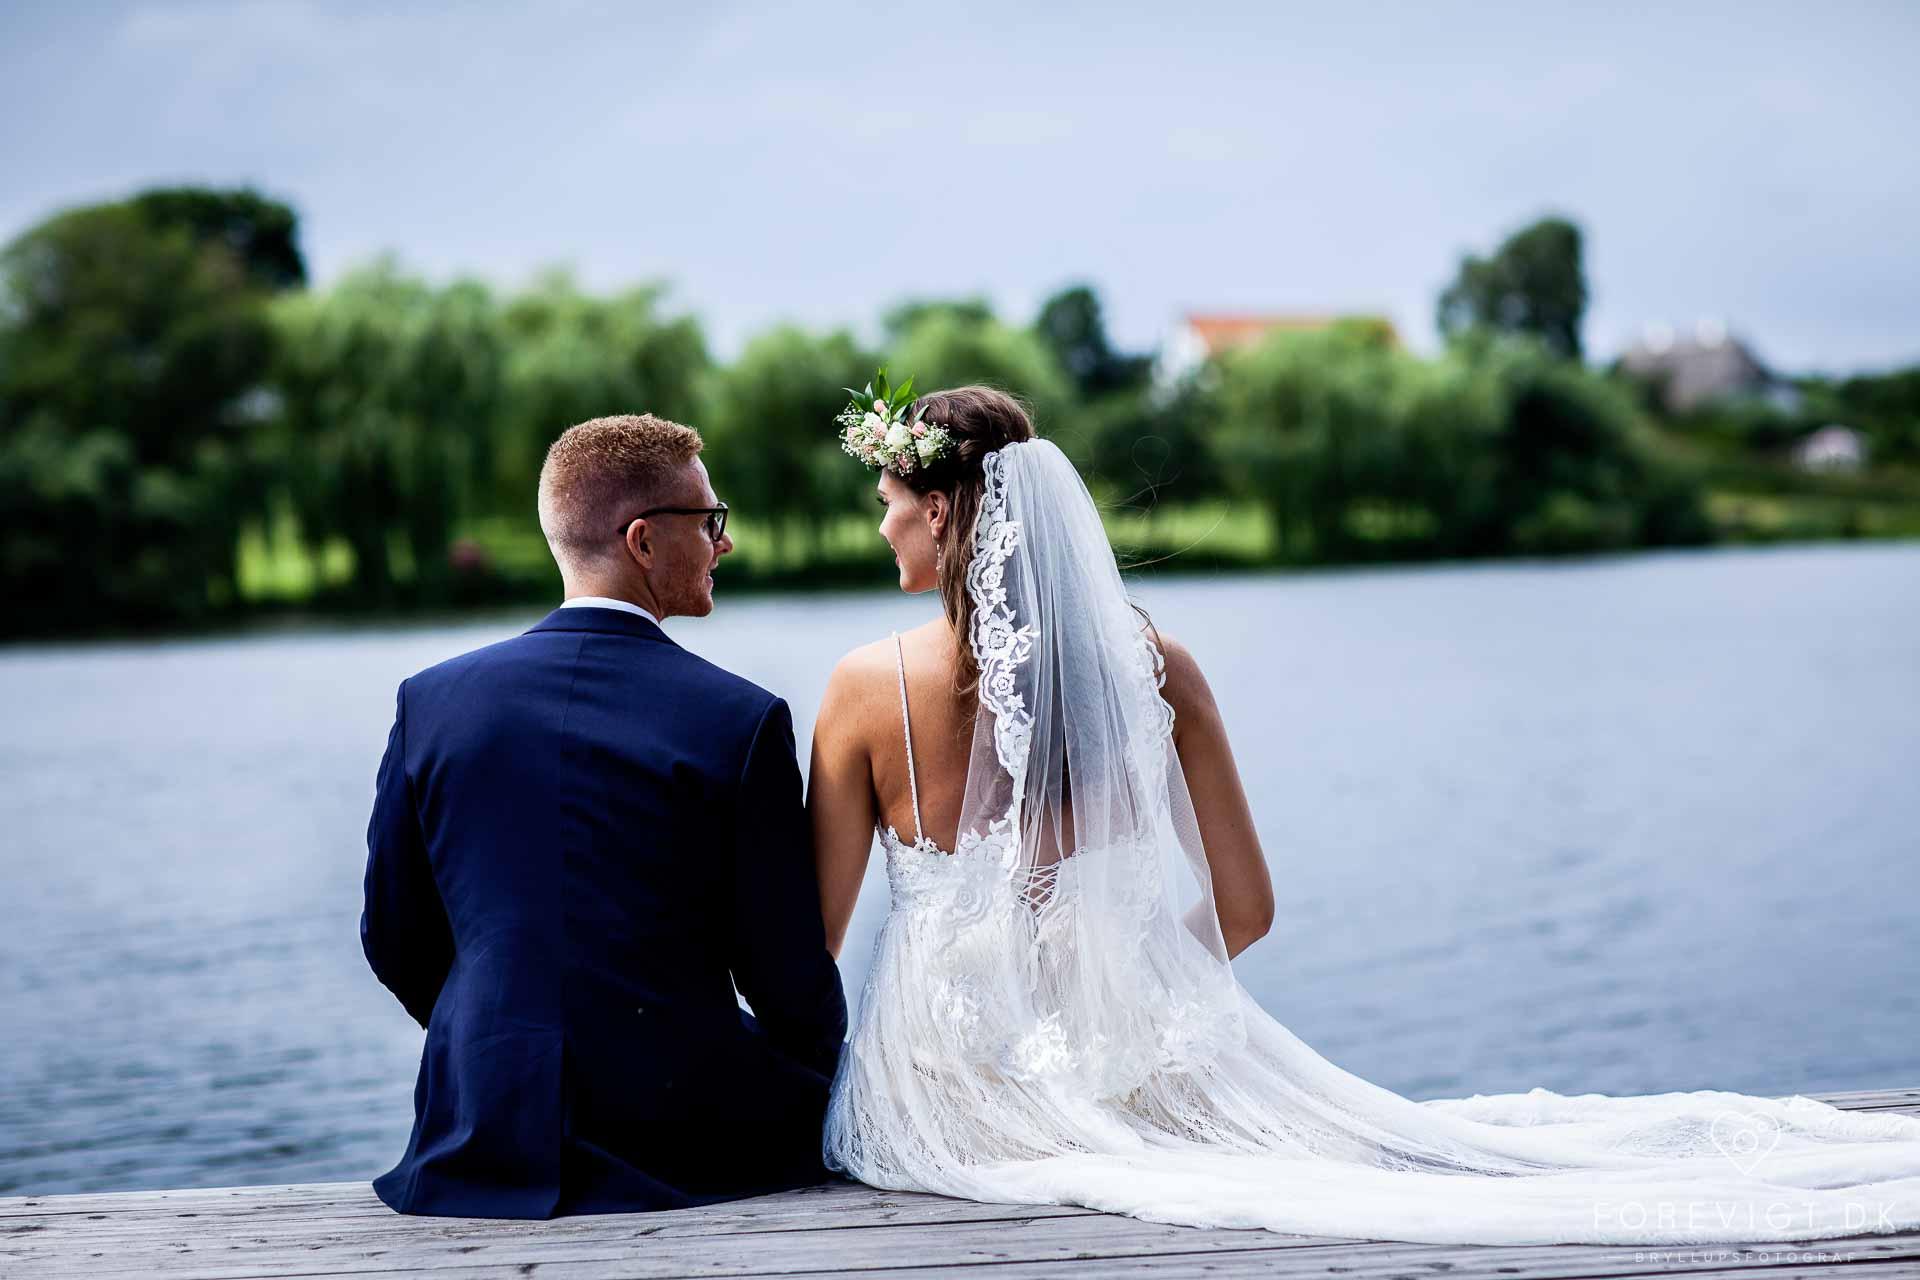 Professionelle bryllupsportrætter - Bryllupsfotograf